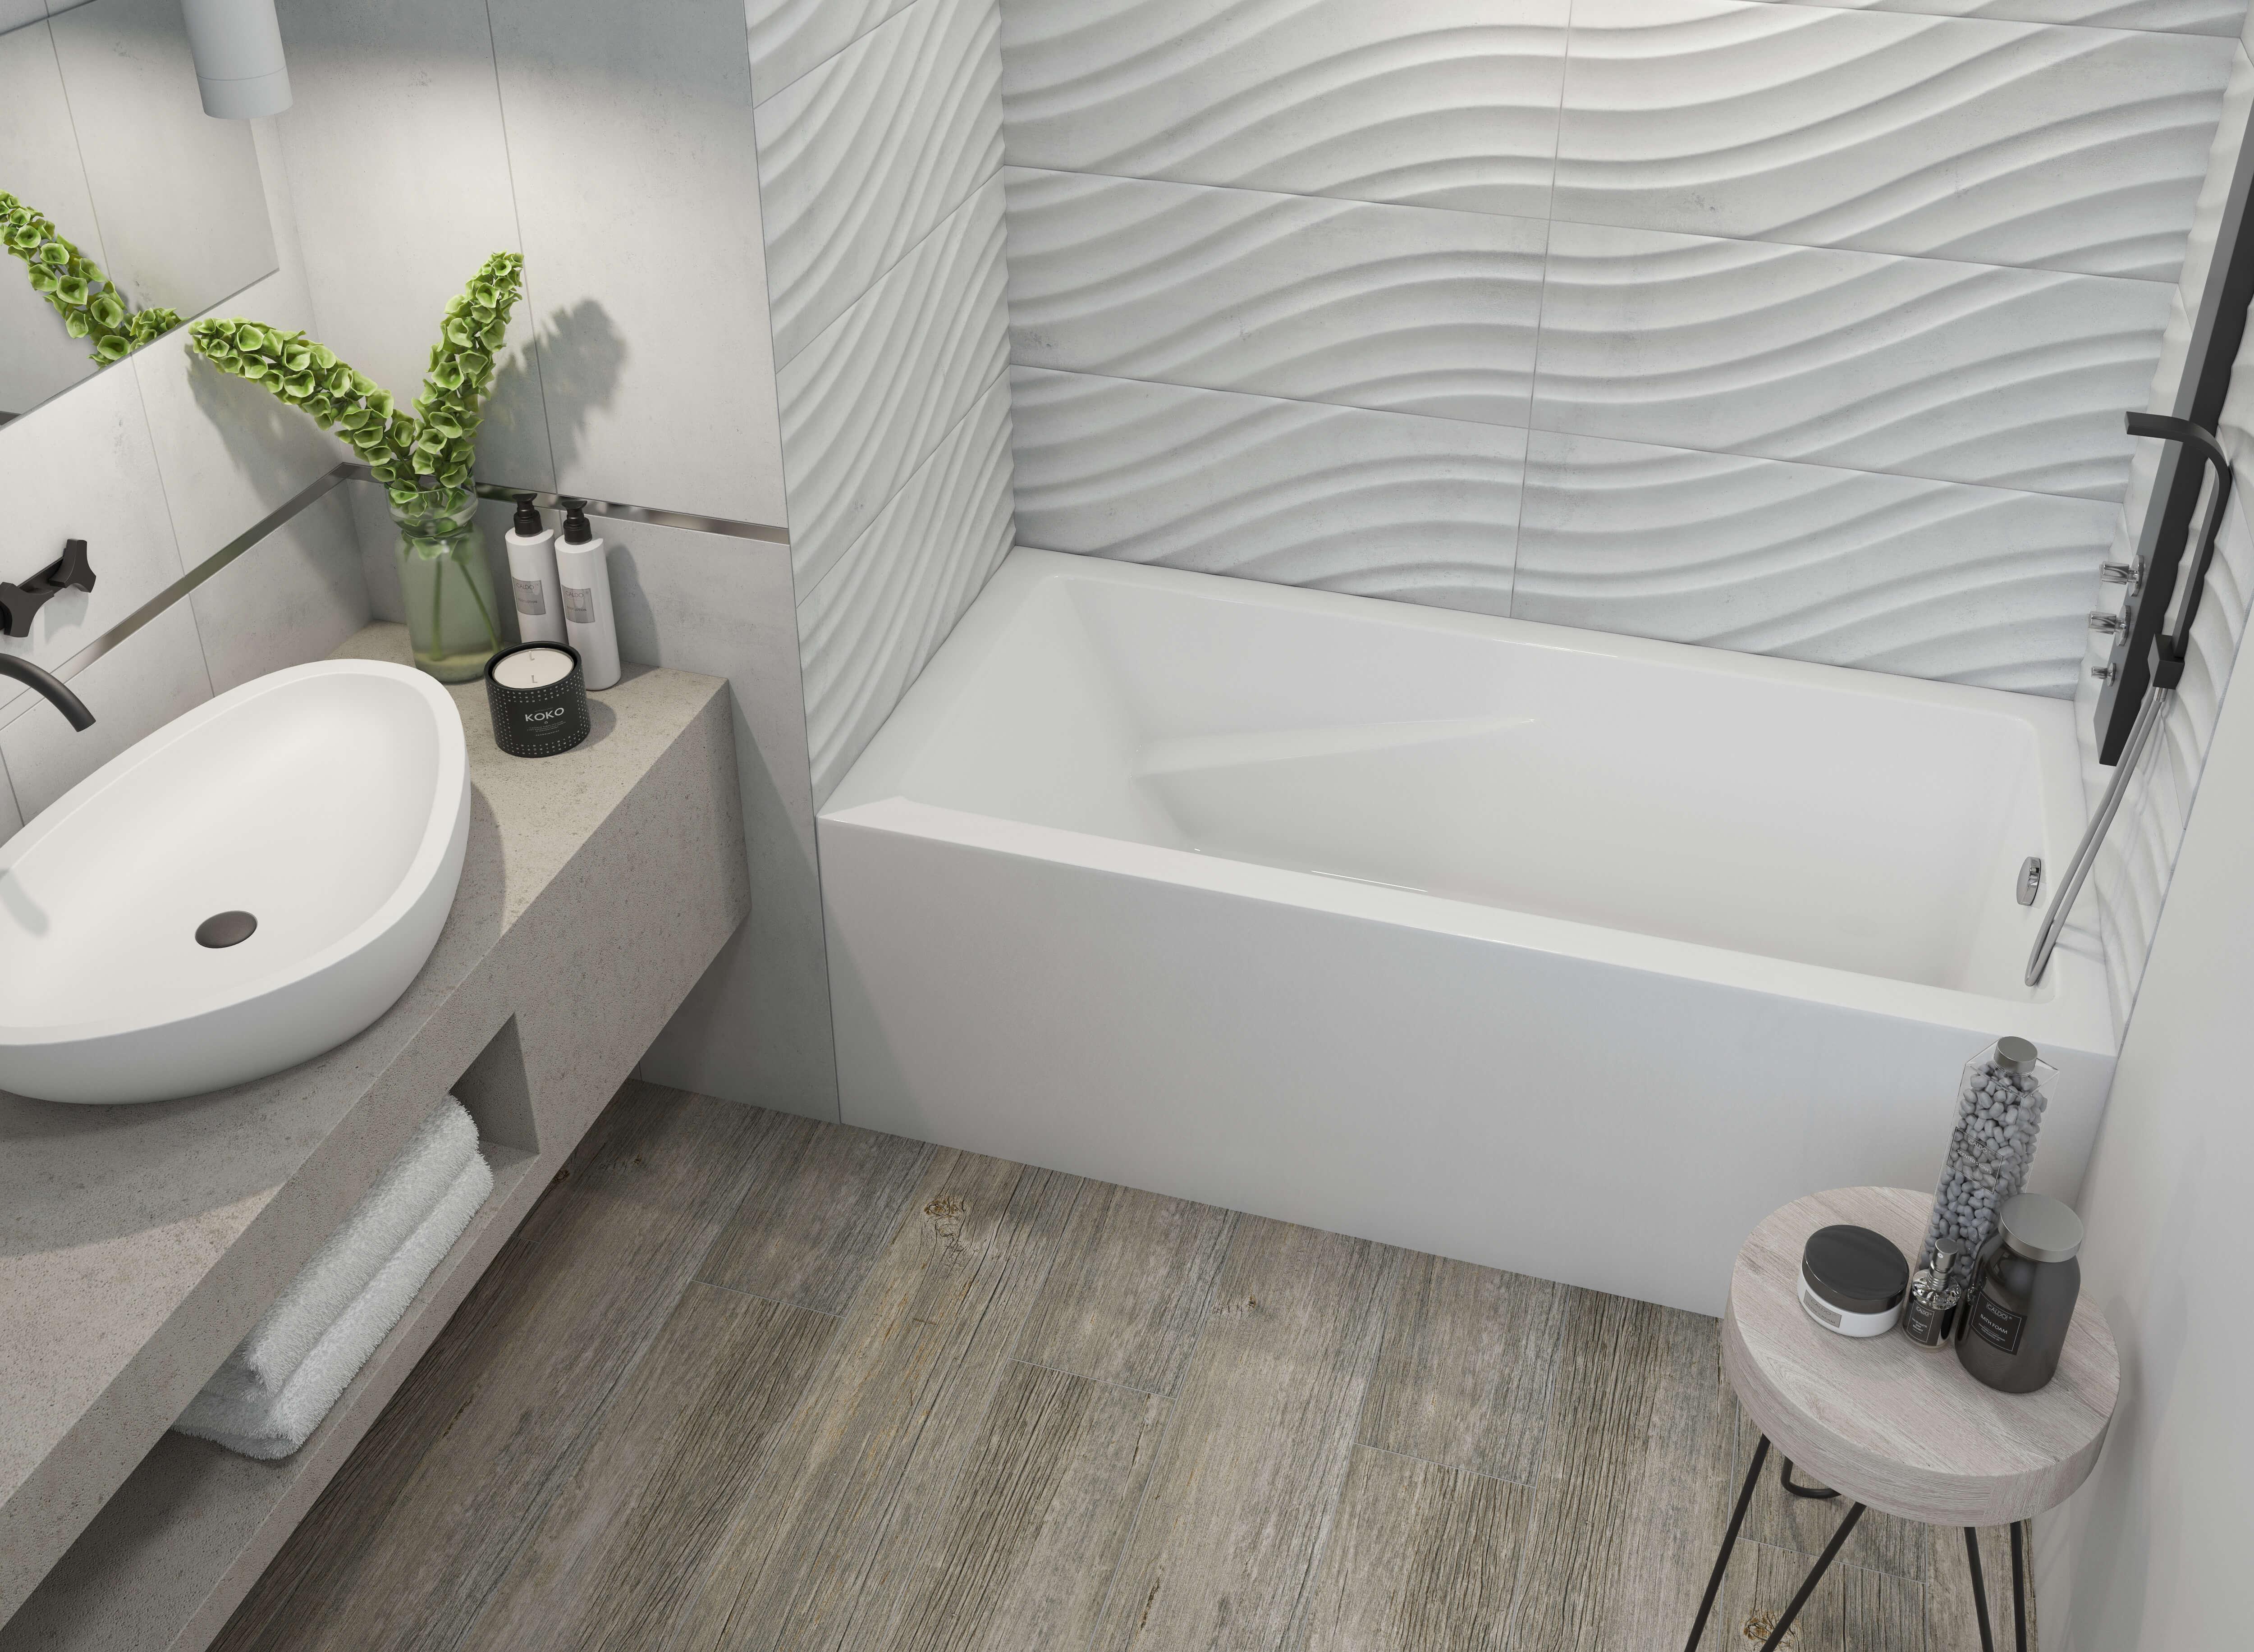 home improvement signature x jacuzzi alcove bathtub wayfair pdx